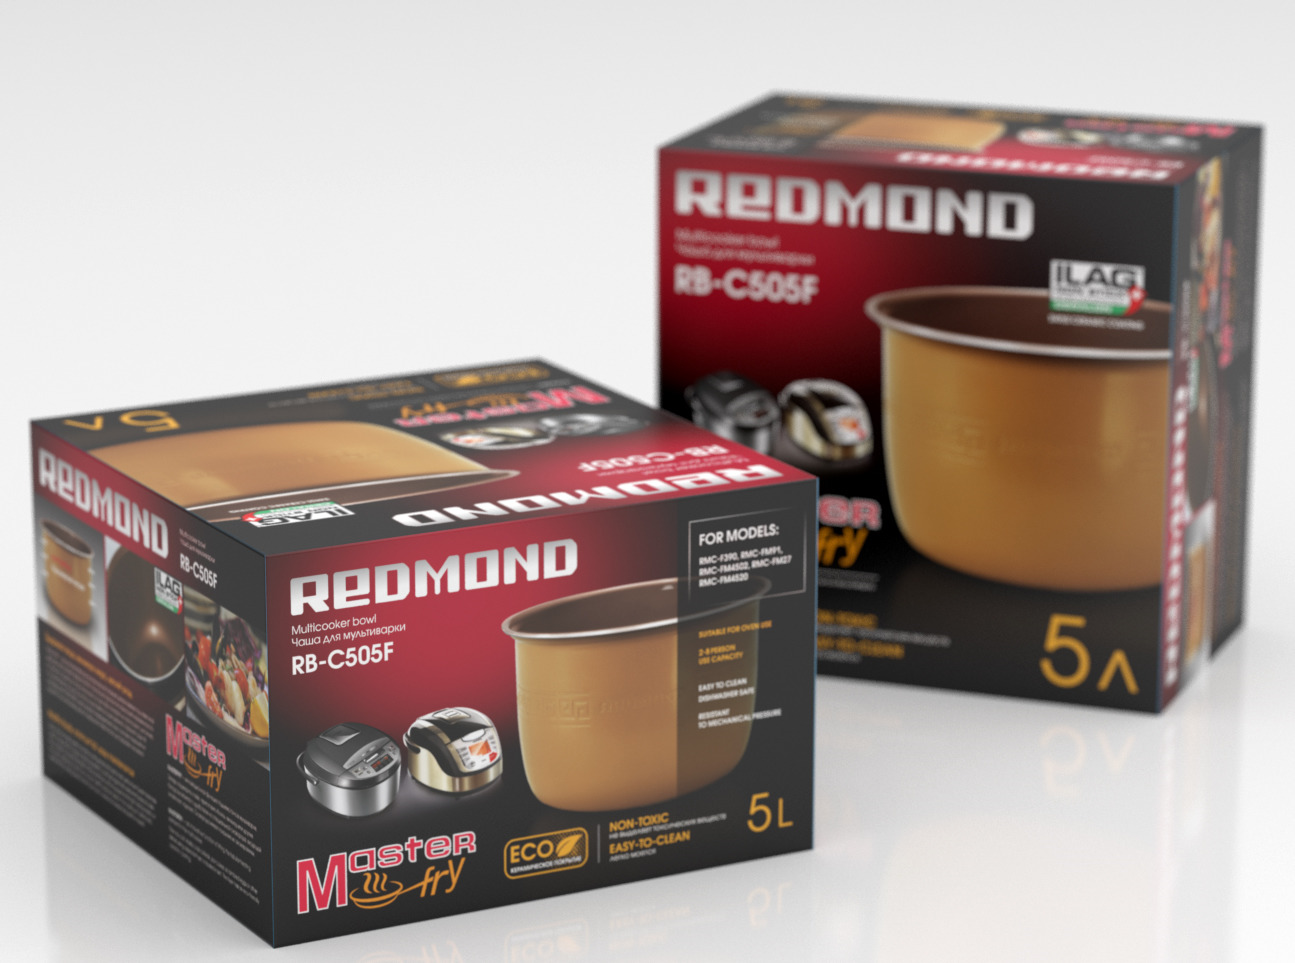 Redmond RB-C505Fчаша для мультиварки Redmond